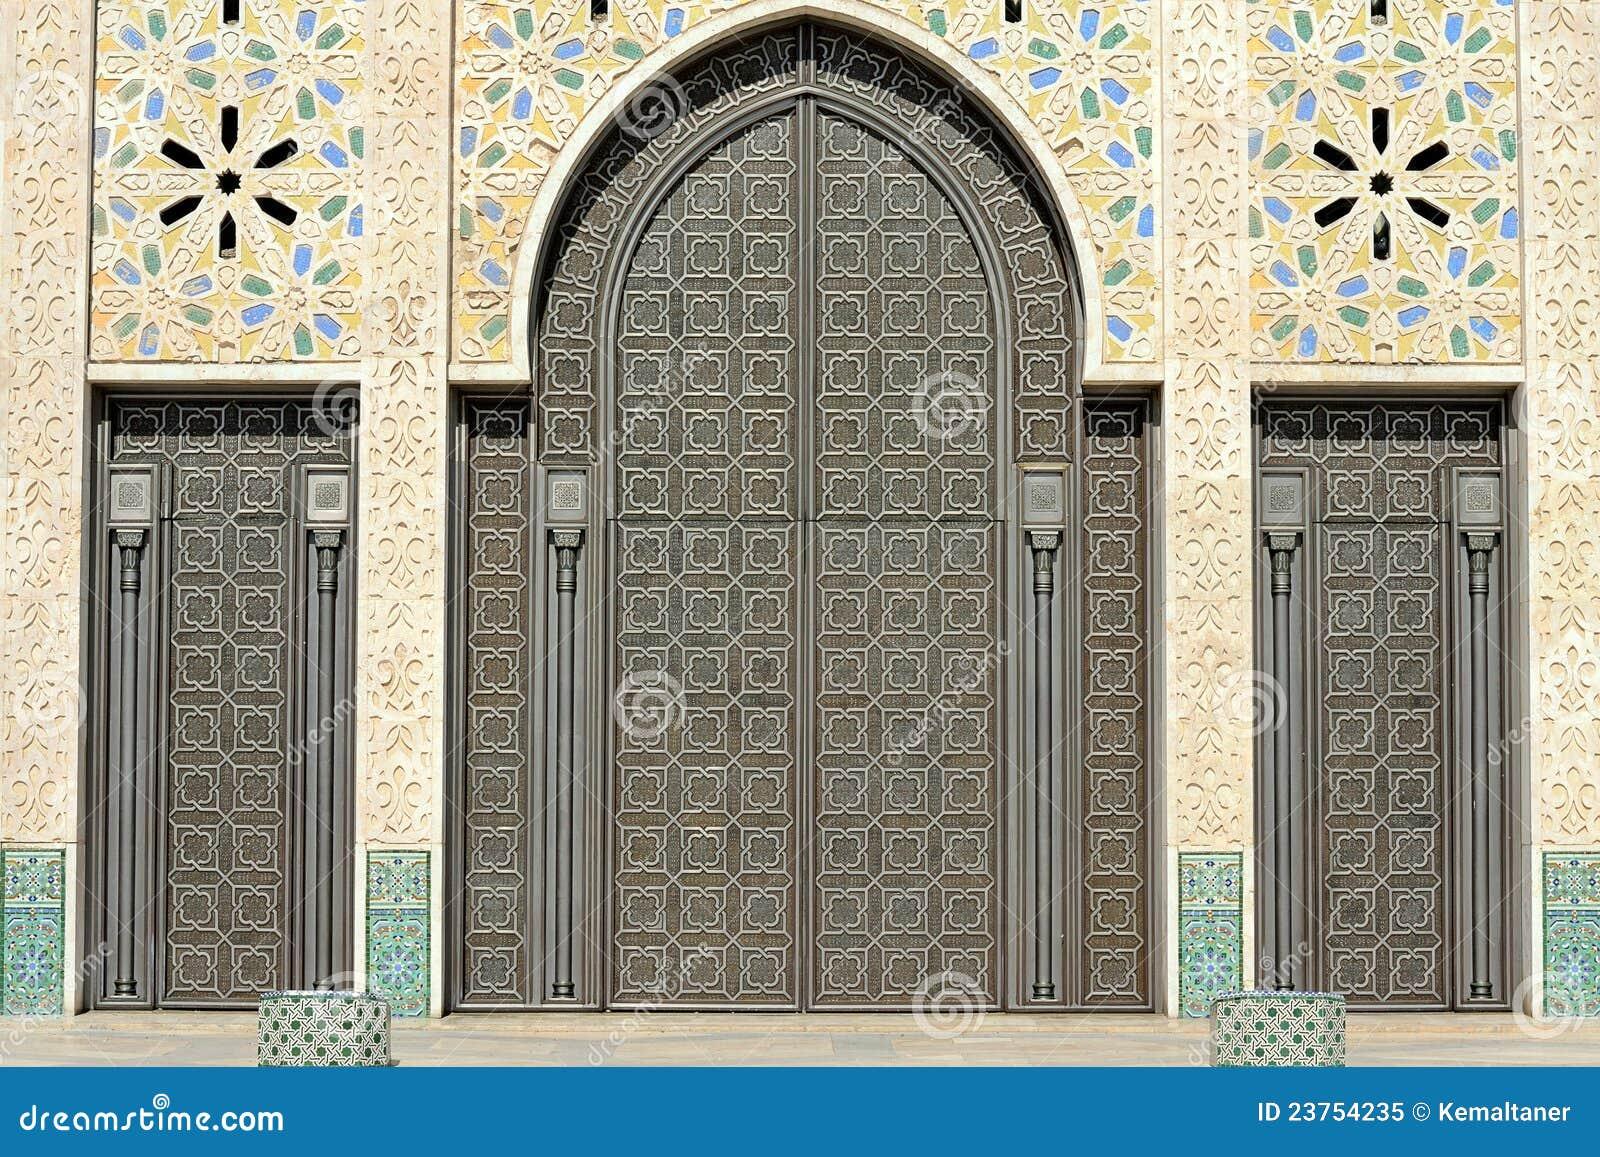 arabesque arches and pillars - photo #44